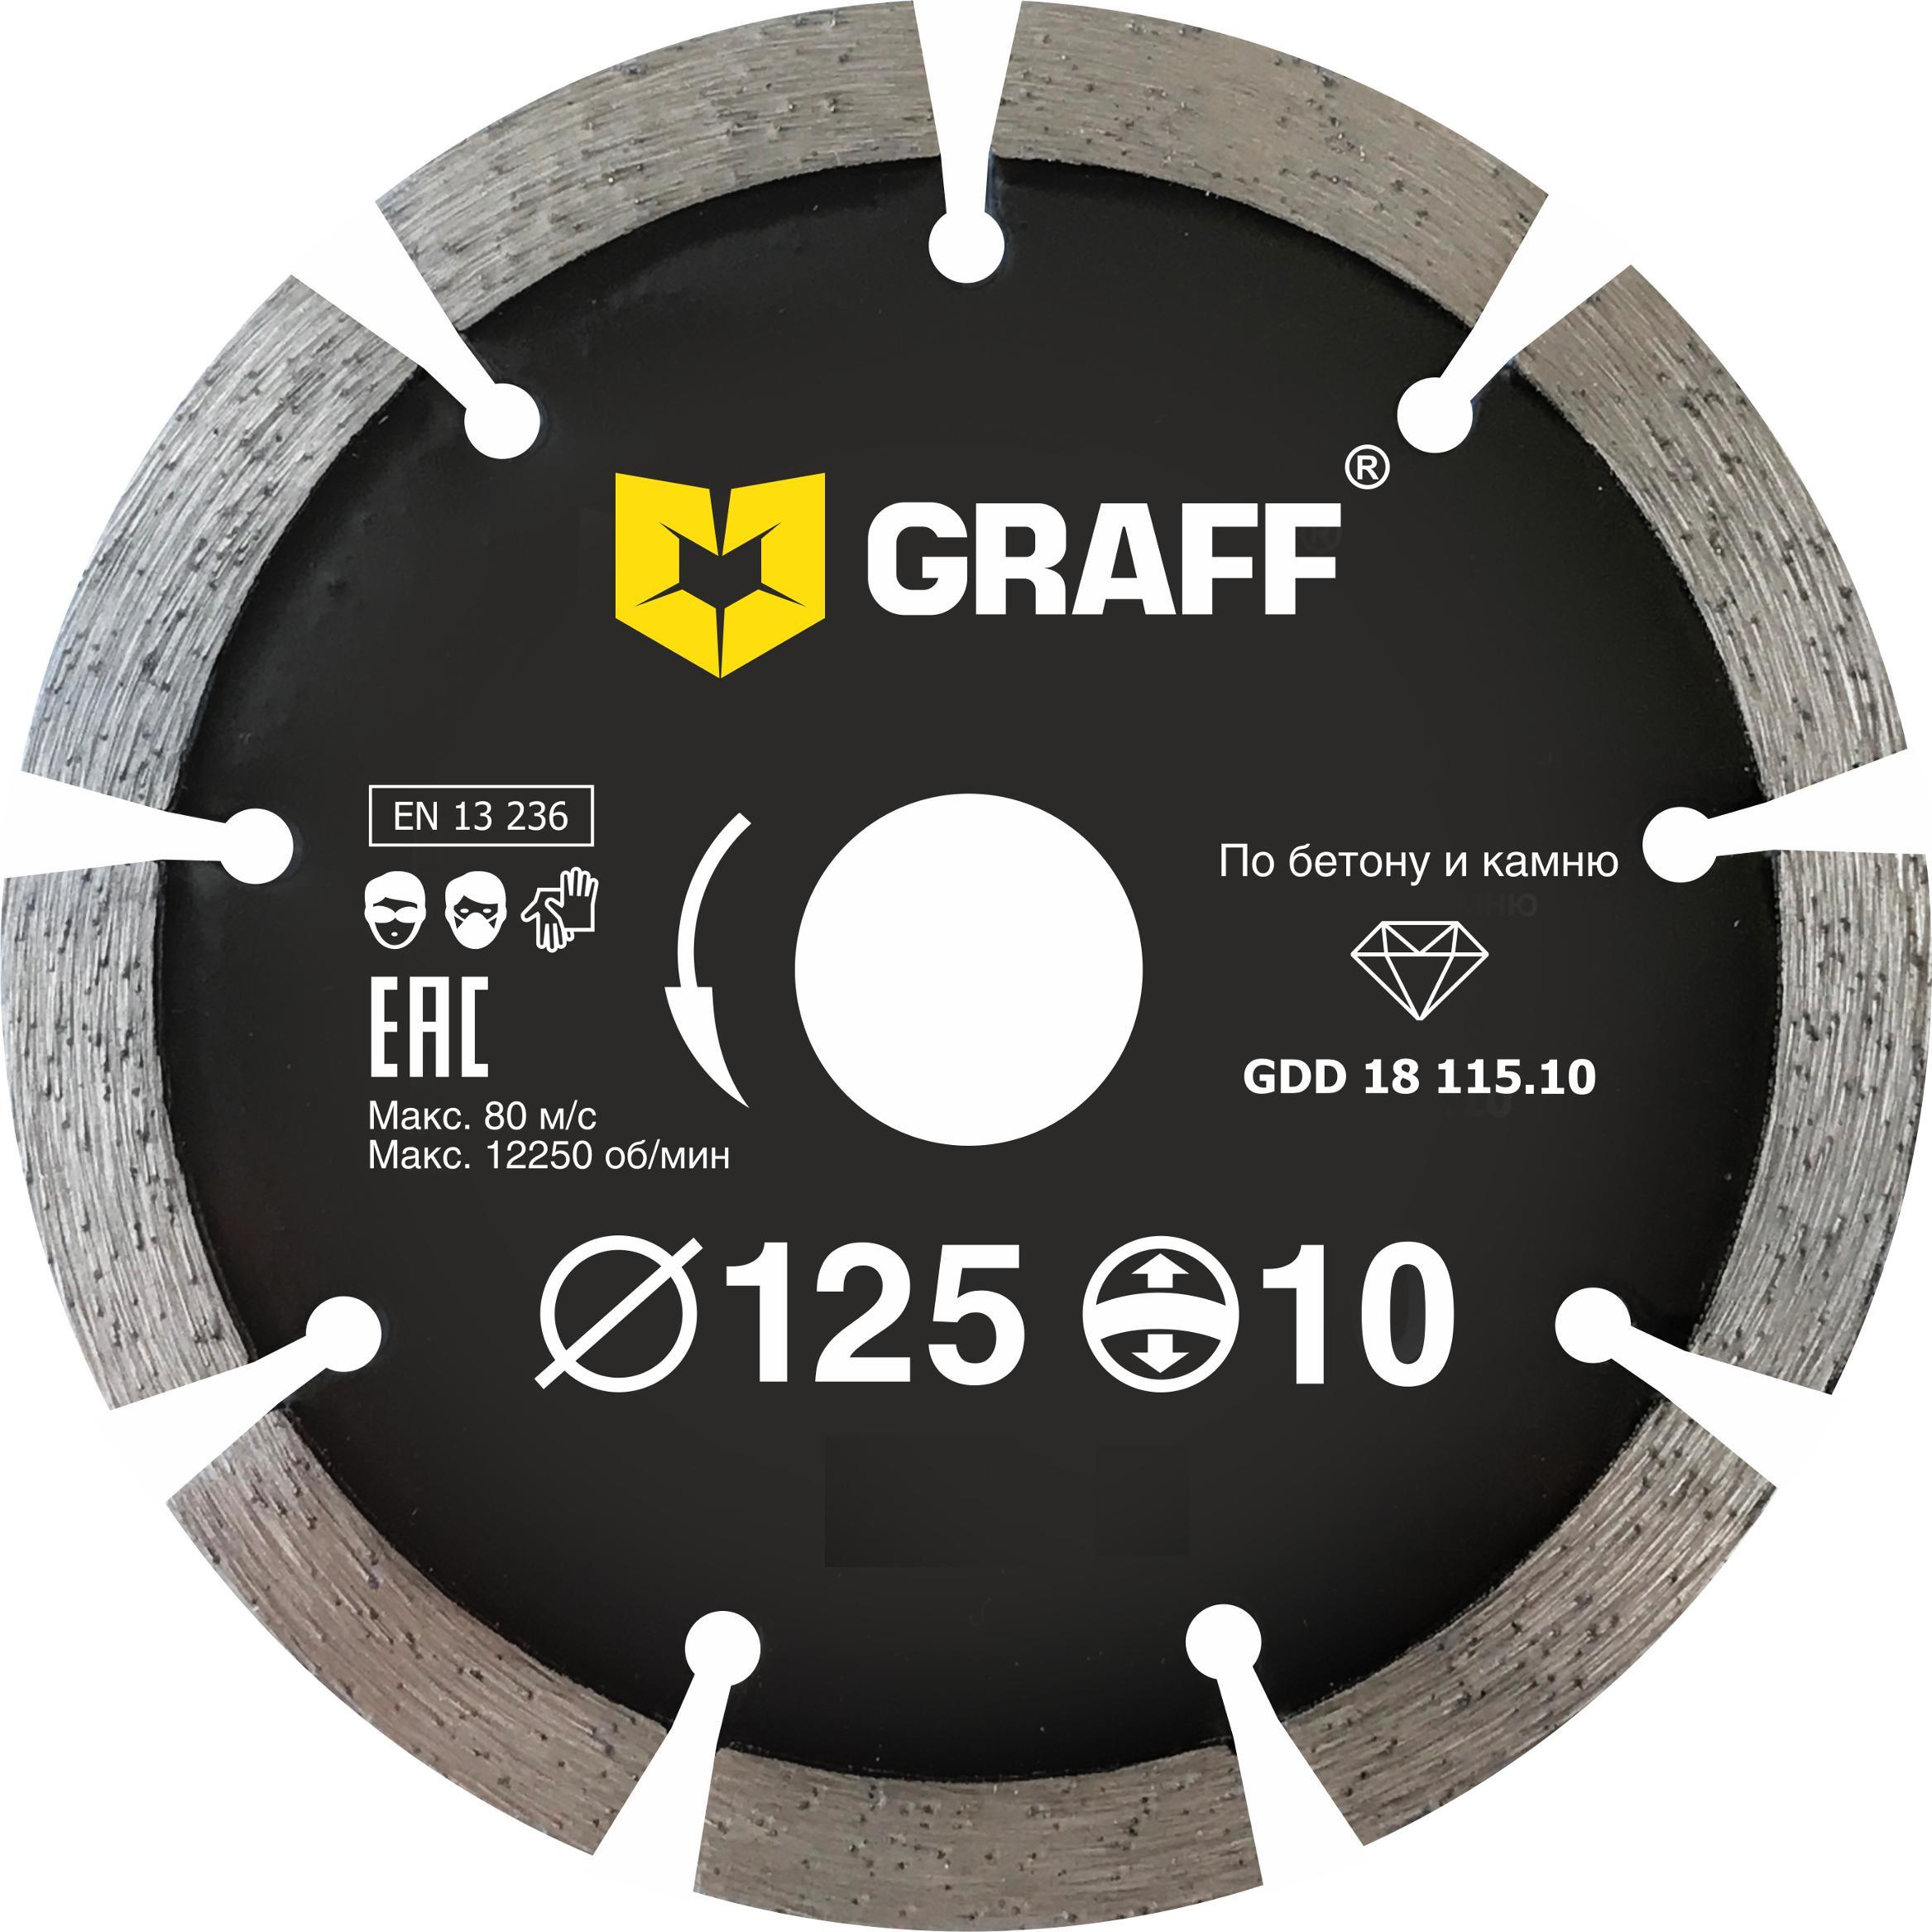 Круг алмазный Graff (gdd 18 125.10) Ф125х22мм по бетону цена и фото